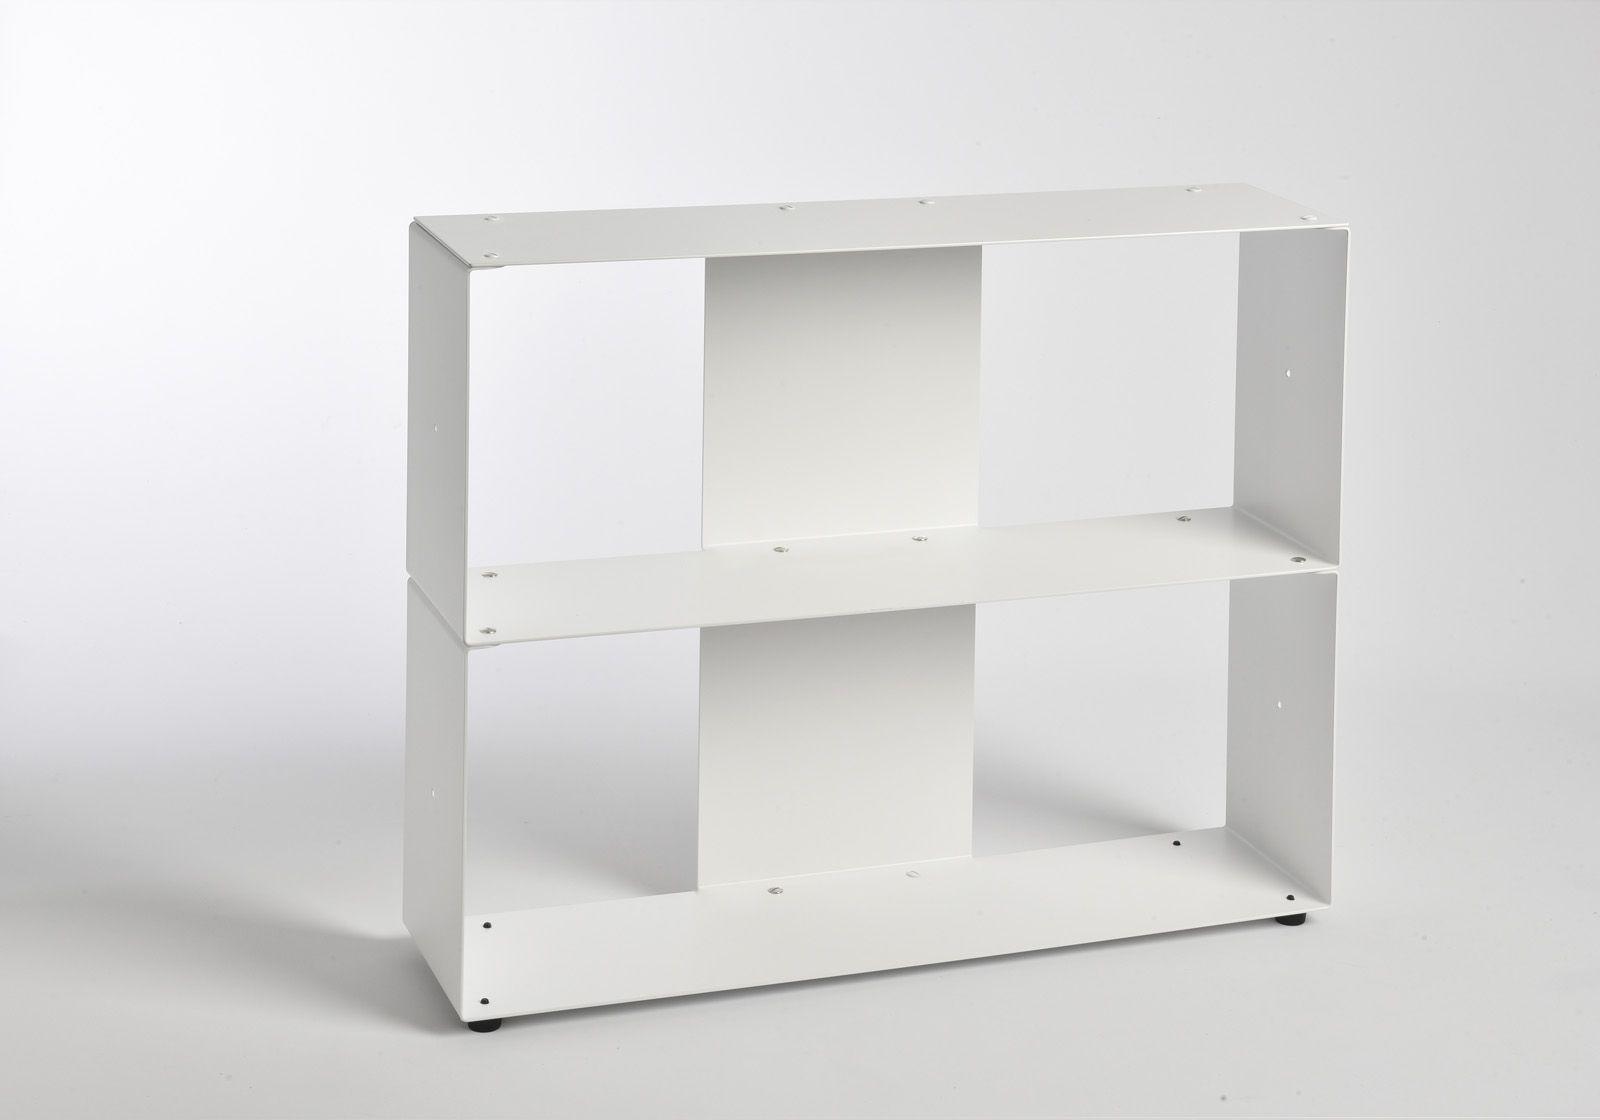 biblioth que basse 60 cm m tal blanc 2 niveaux. Black Bedroom Furniture Sets. Home Design Ideas